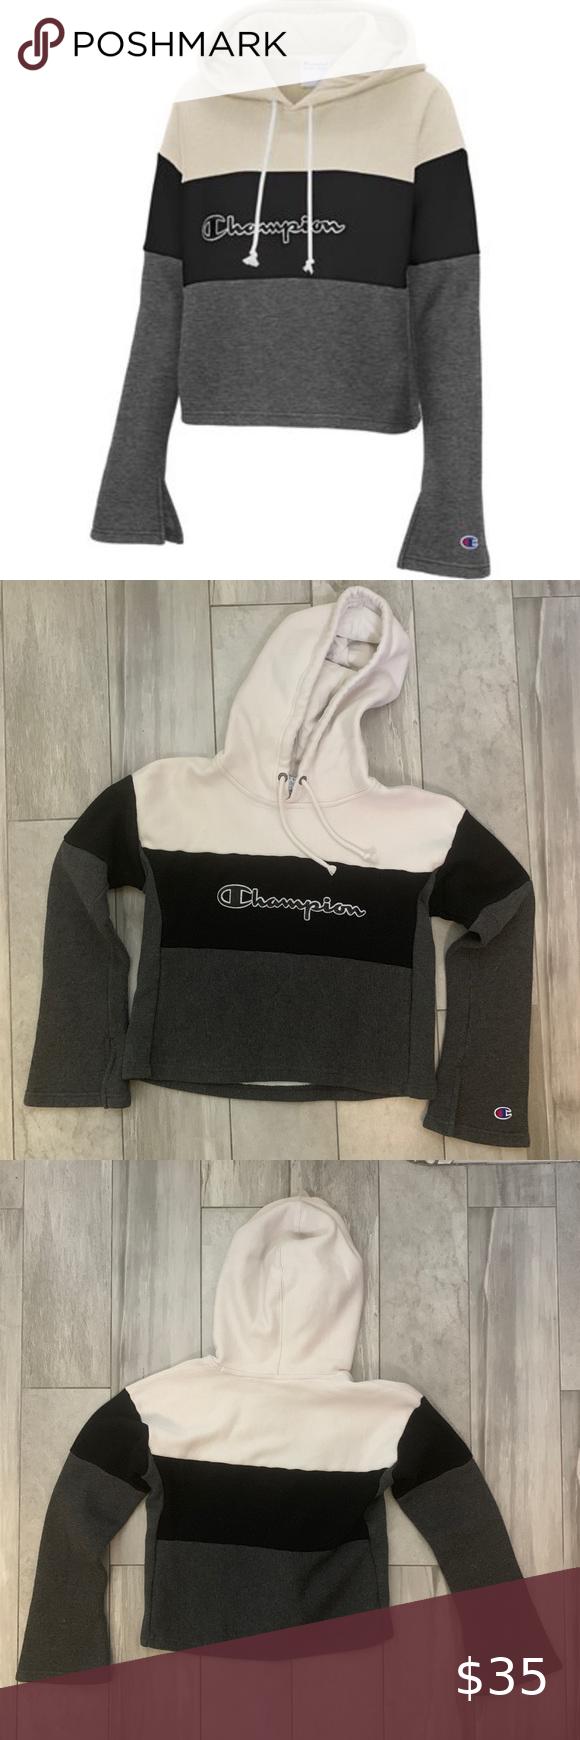 Champion Hoodie Xs Hoodie Sweatshirts Outfit Black Champion Hoodie Grey Champion Hoodie [ 1740 x 580 Pixel ]